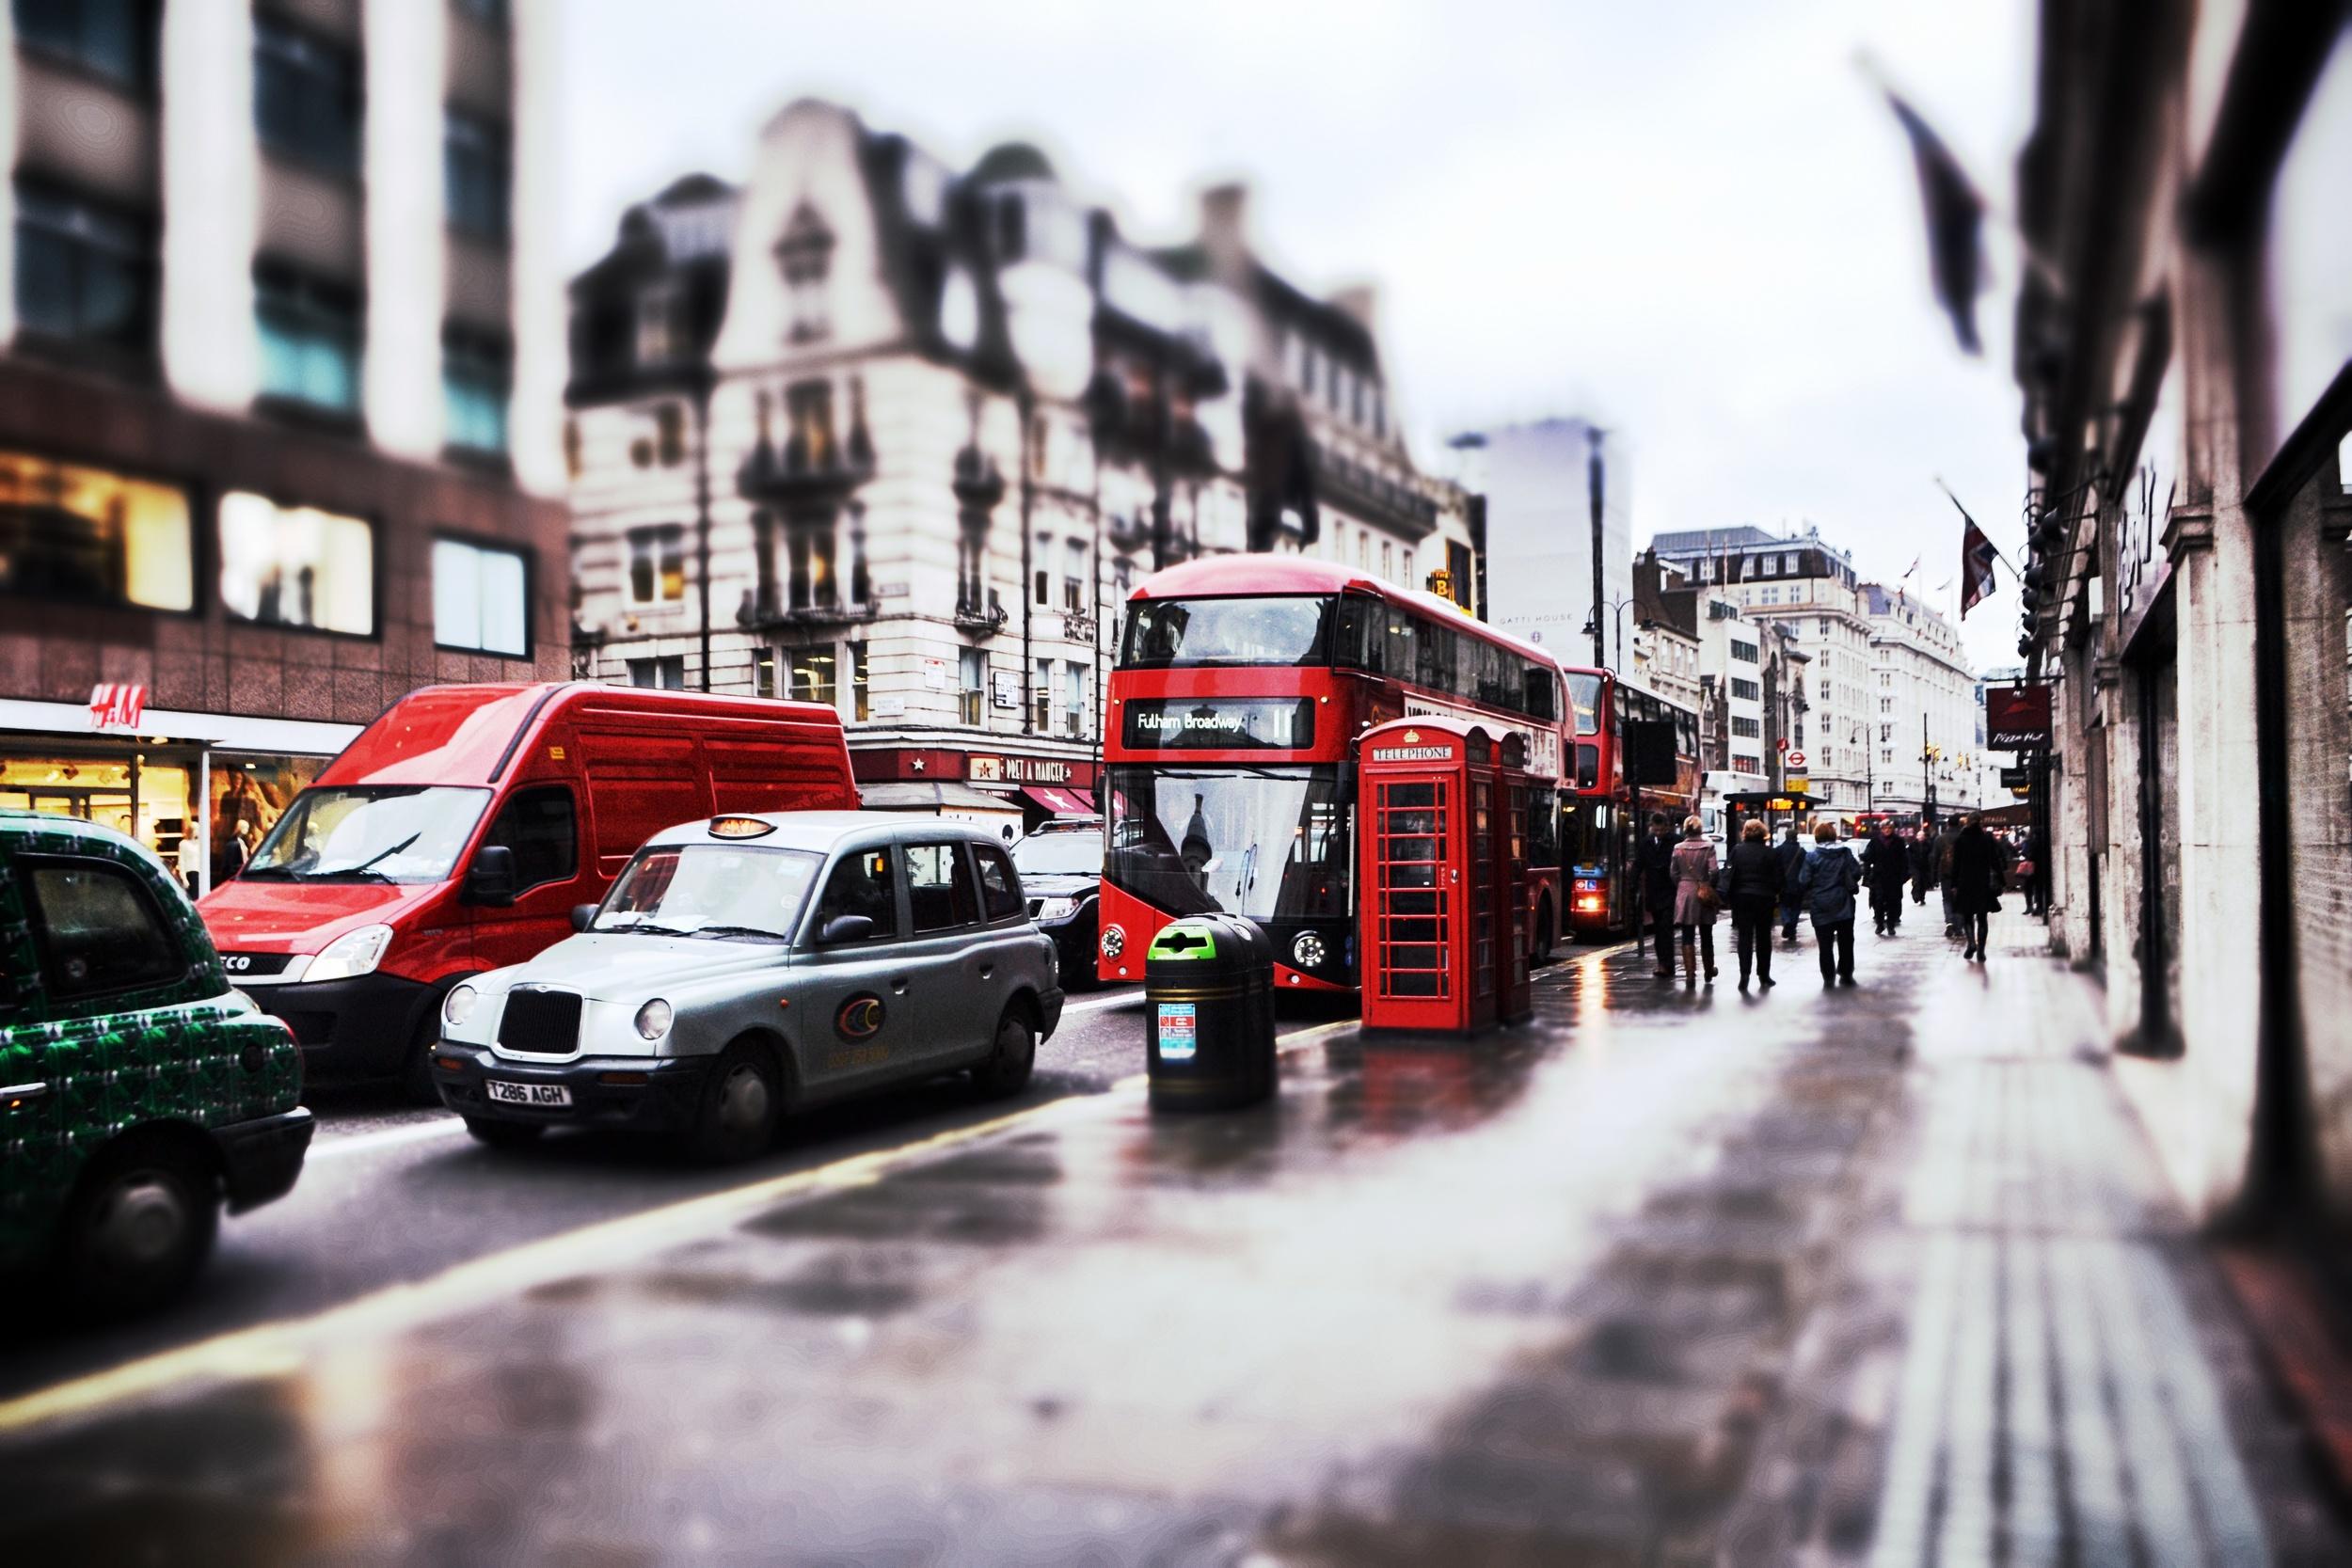 the London three